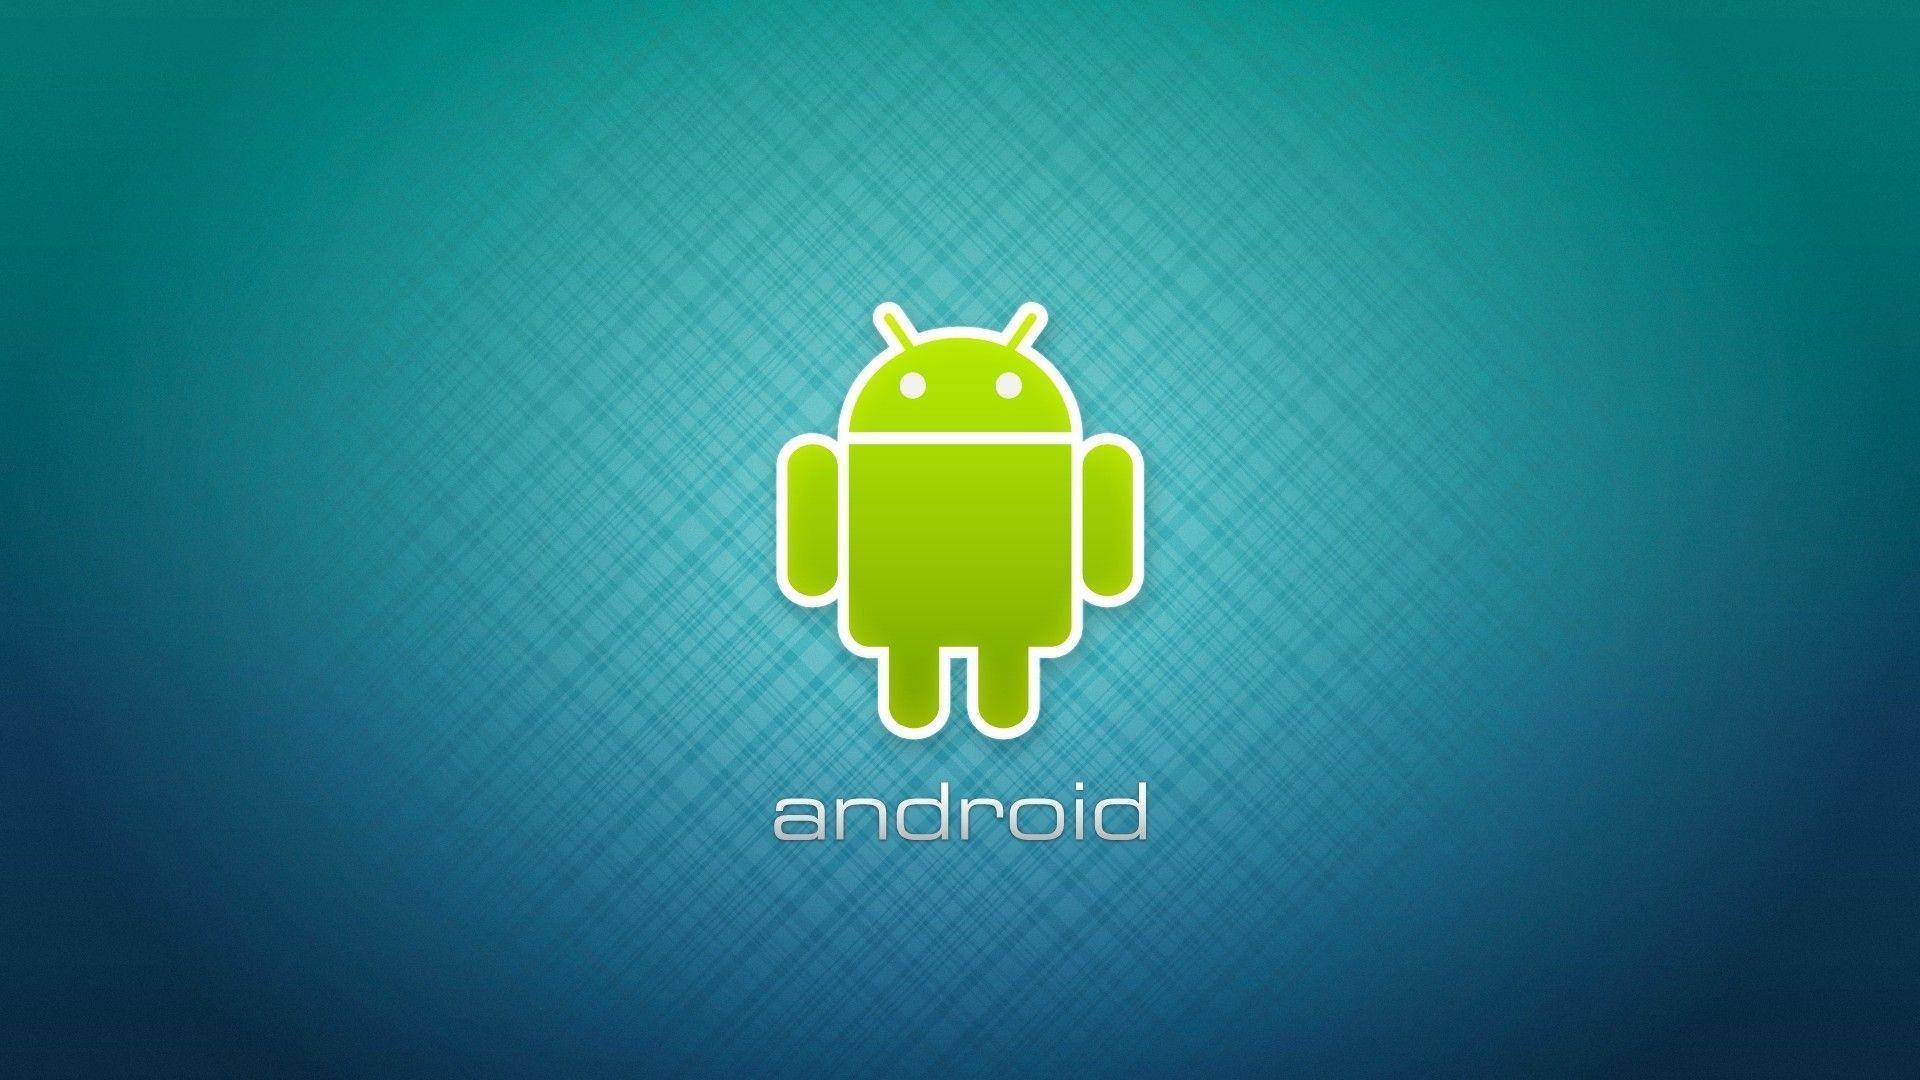 Fantastic Android Logo Wallpaper 43634 1920x1080 px ~ HDWallSource.